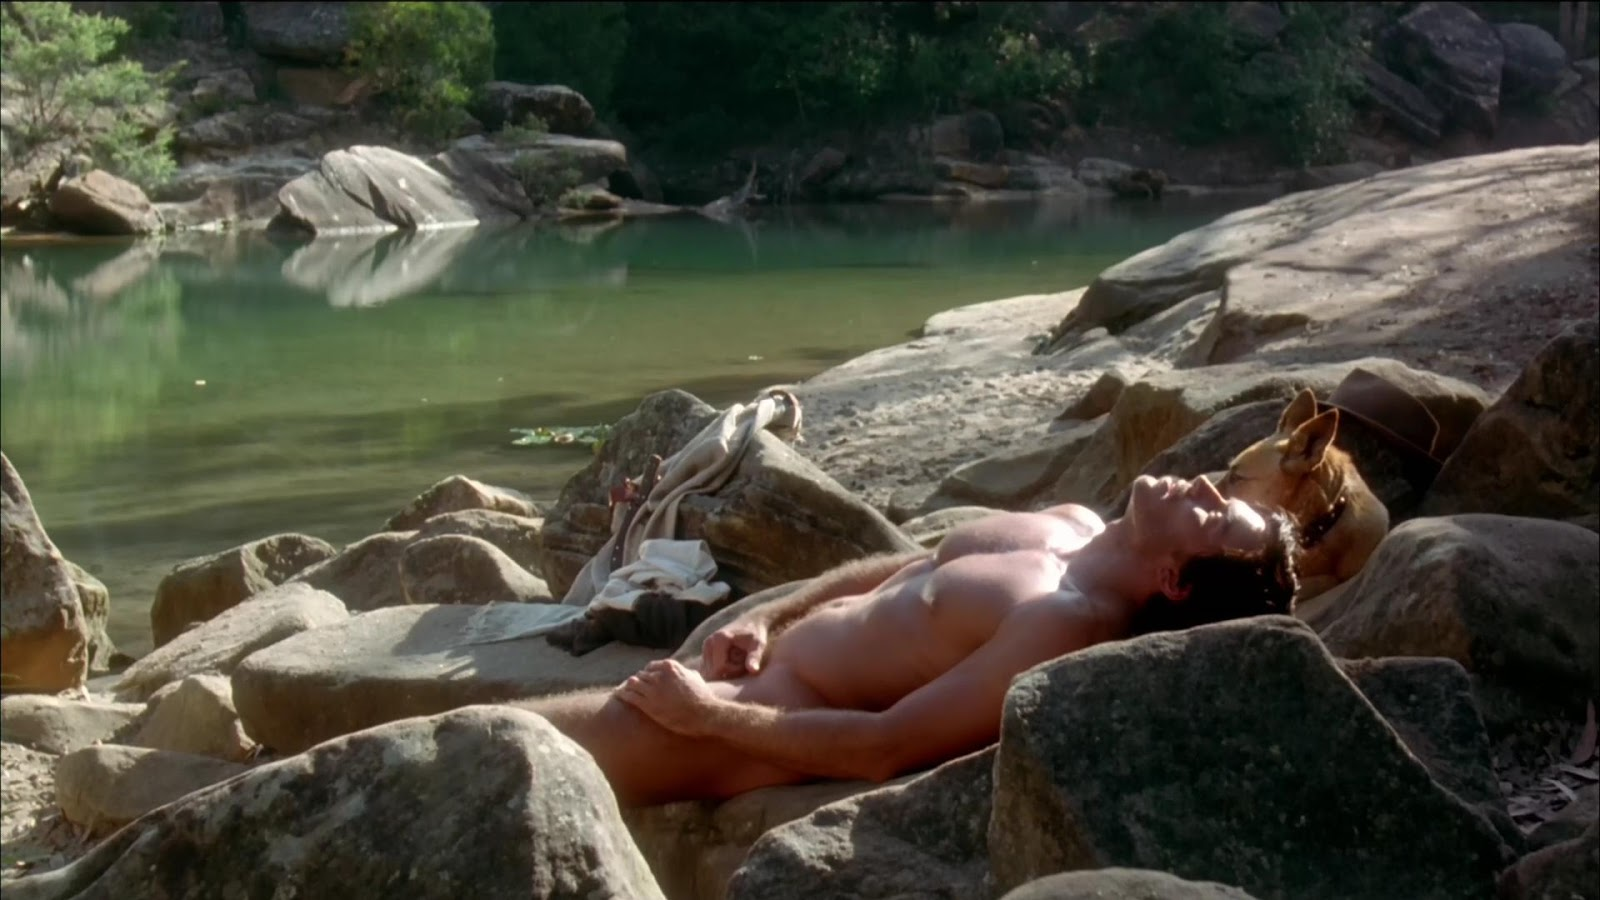 kareena kapoor nude fucking images